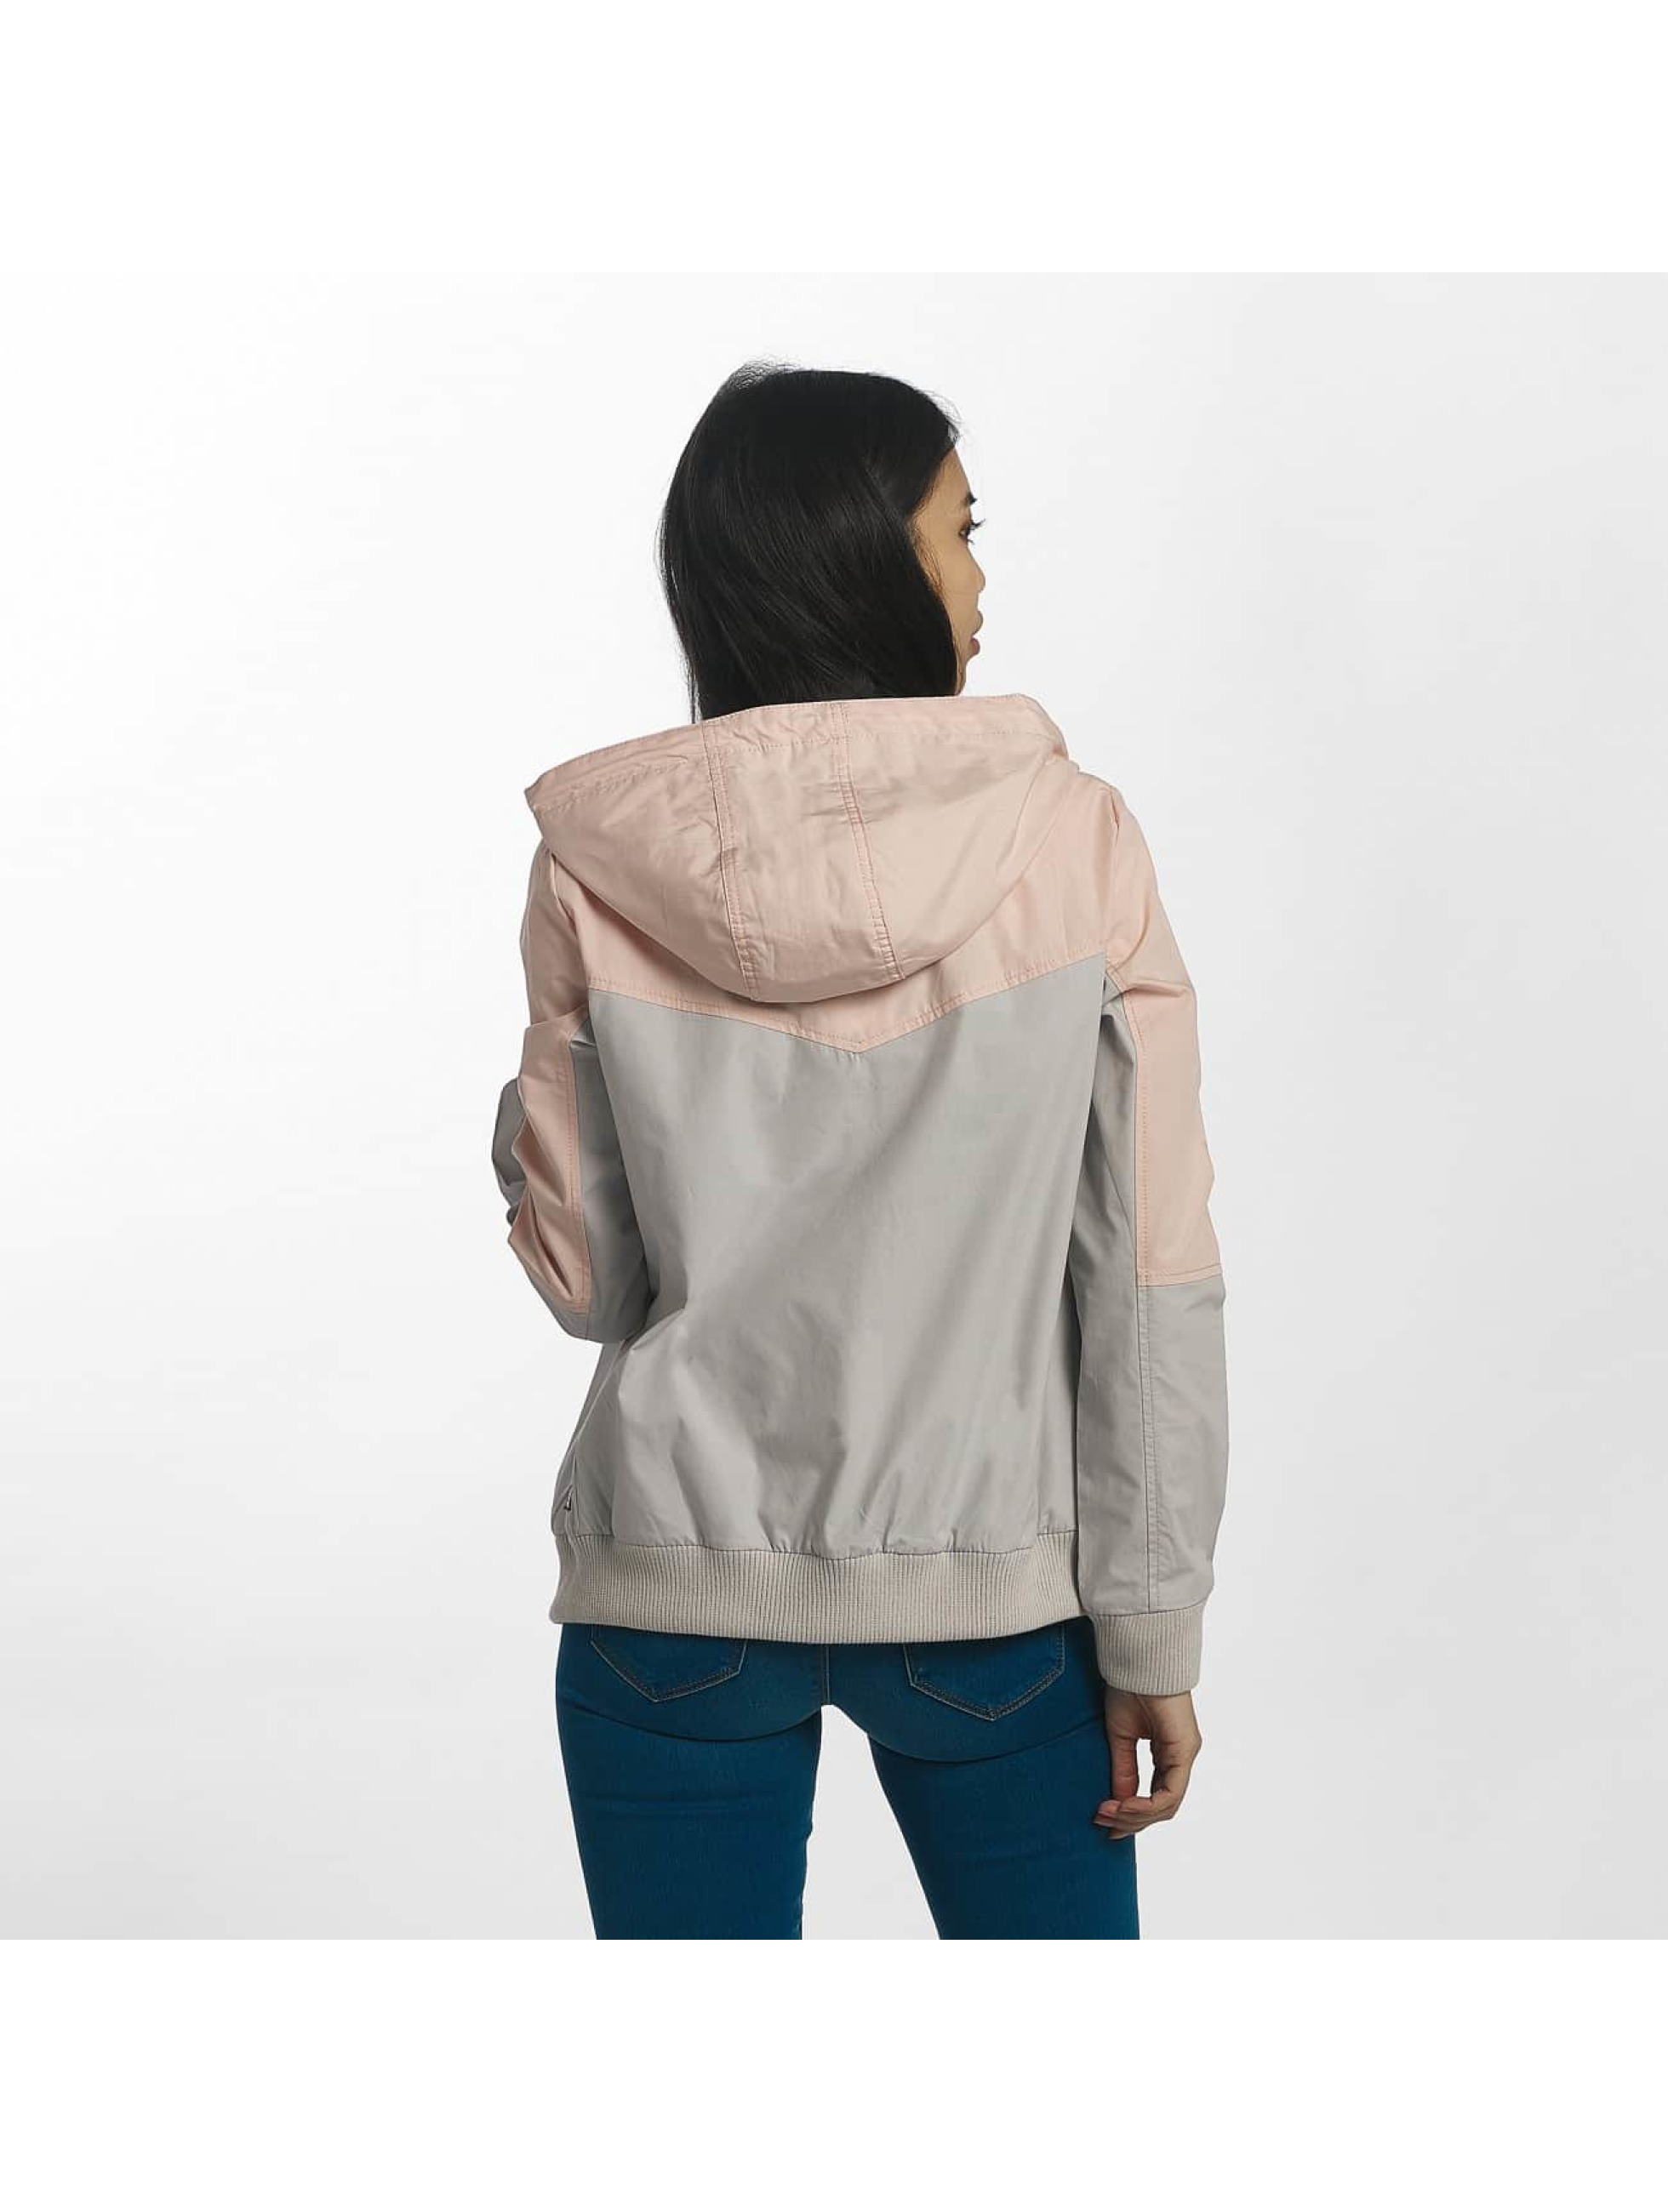 Sublevel Демисезонная куртка Makkara серый